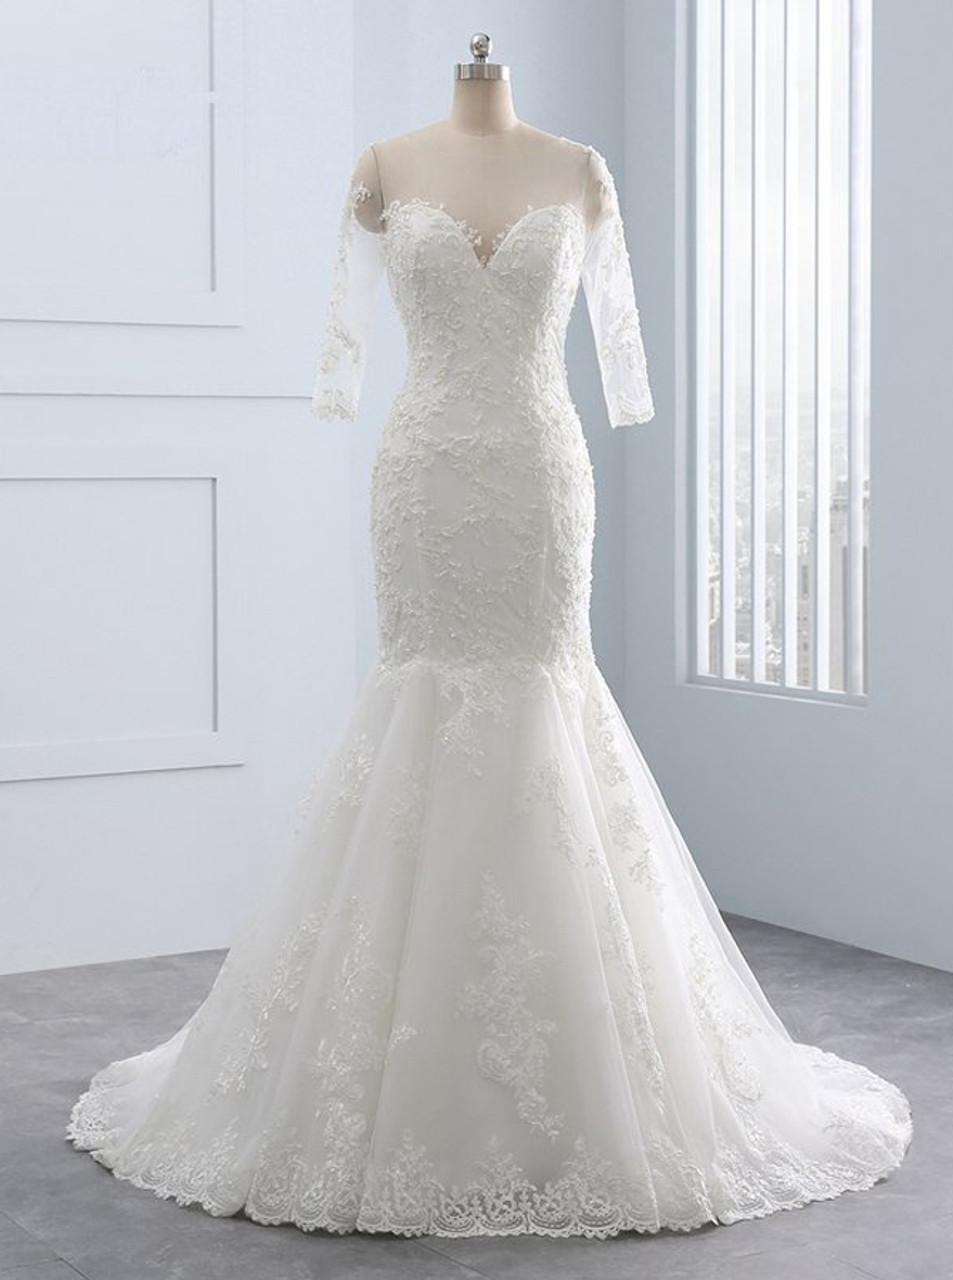 Mermaid Wedding Dresses with 20/20 Length Sleeves,Lace Wedding Dress,20